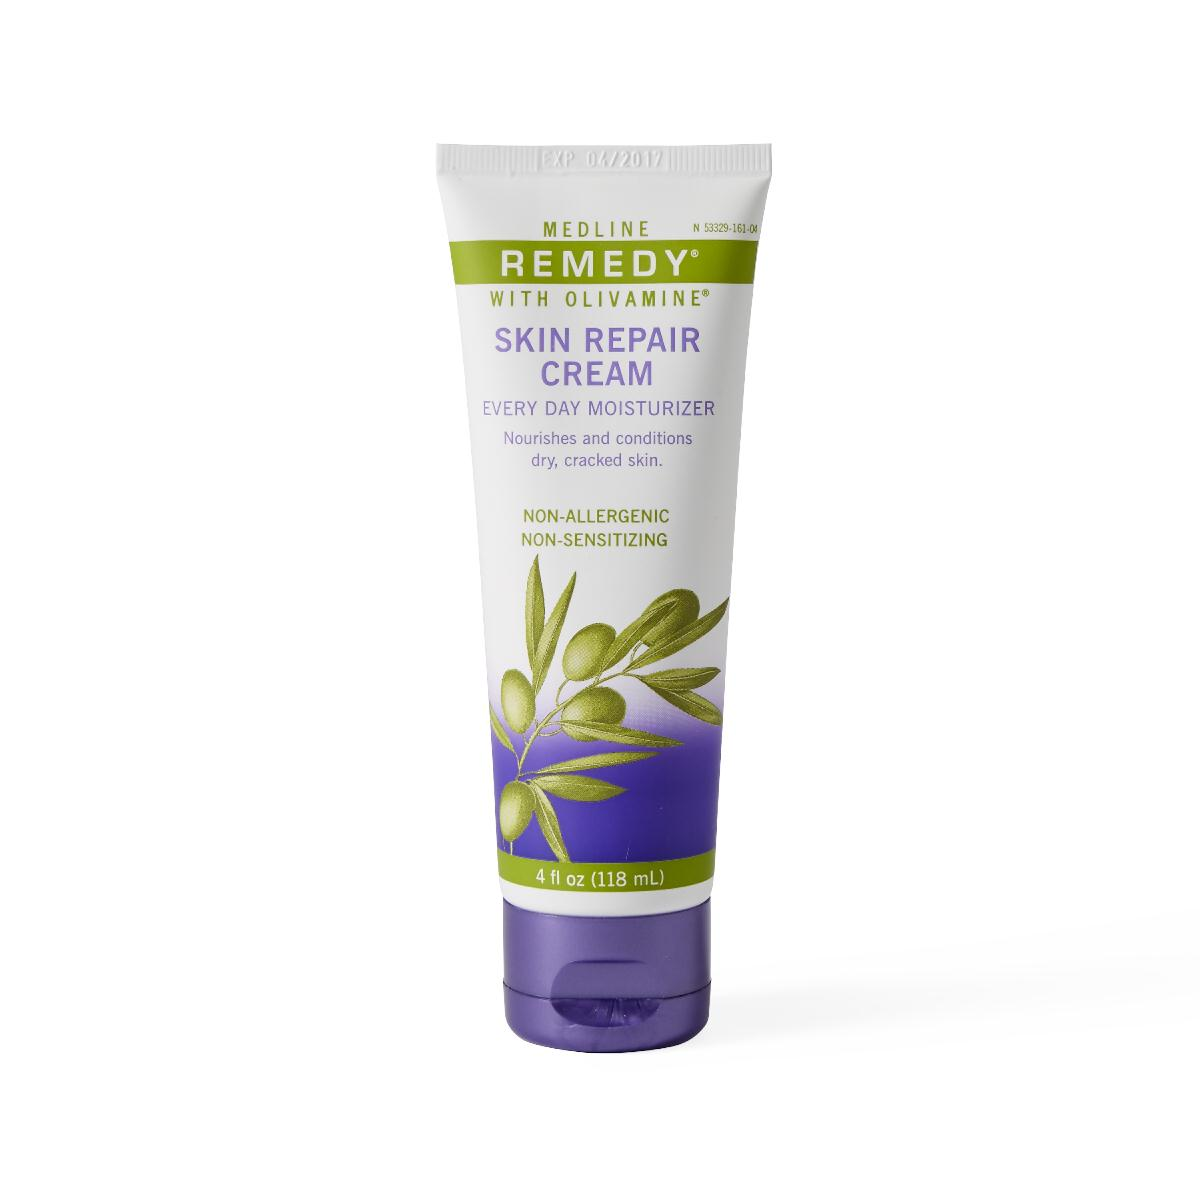 Cream, Skin Repair, Remedy, 2 Oz Tube Daily Energizer Lovely Lip Balm Clarins 0.1 oz Lip Balm For Women